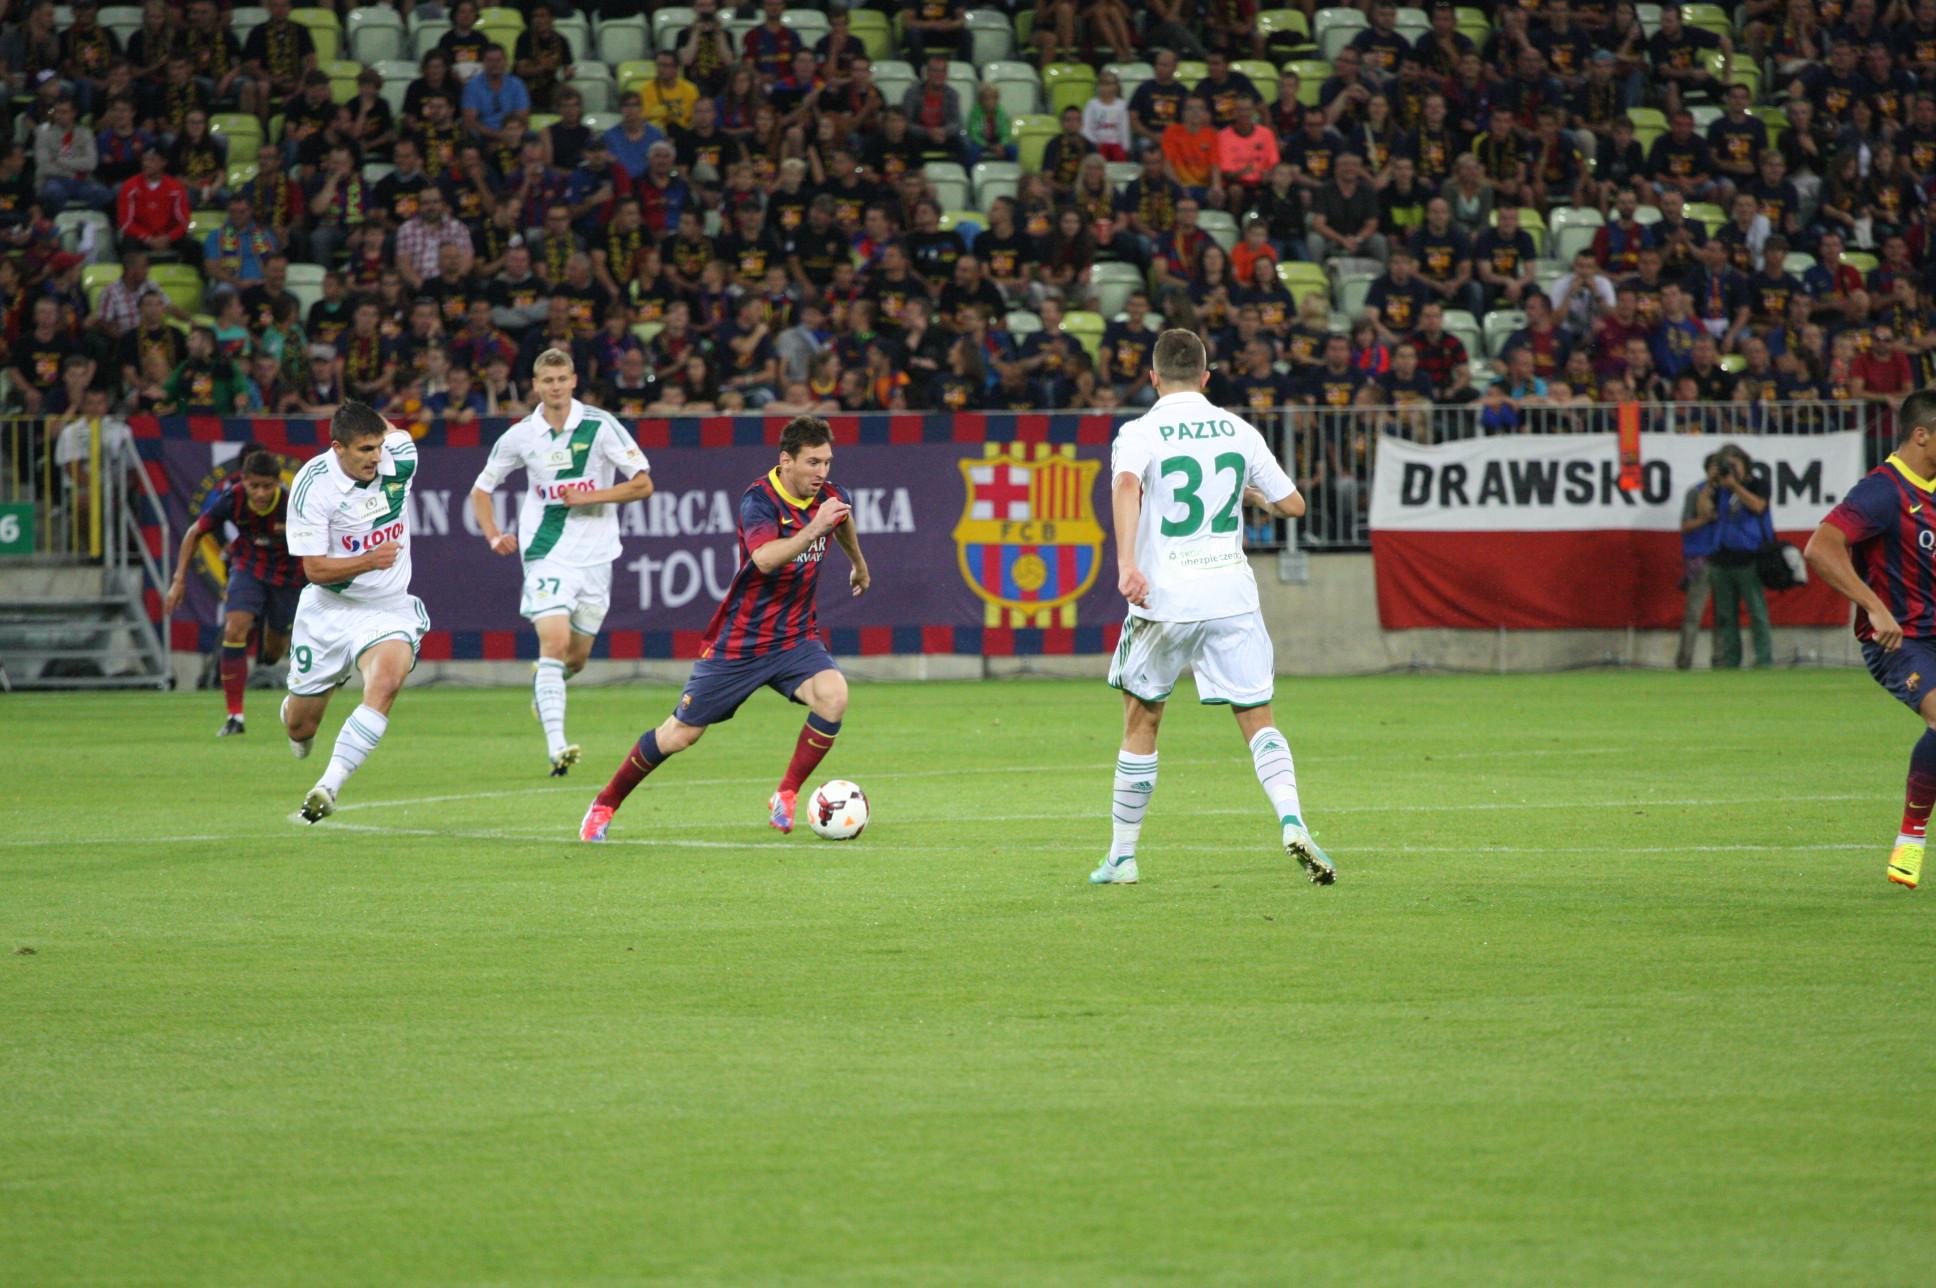 Galeria zdjęć Fc Barcelona vs. Lechia Gdańsk